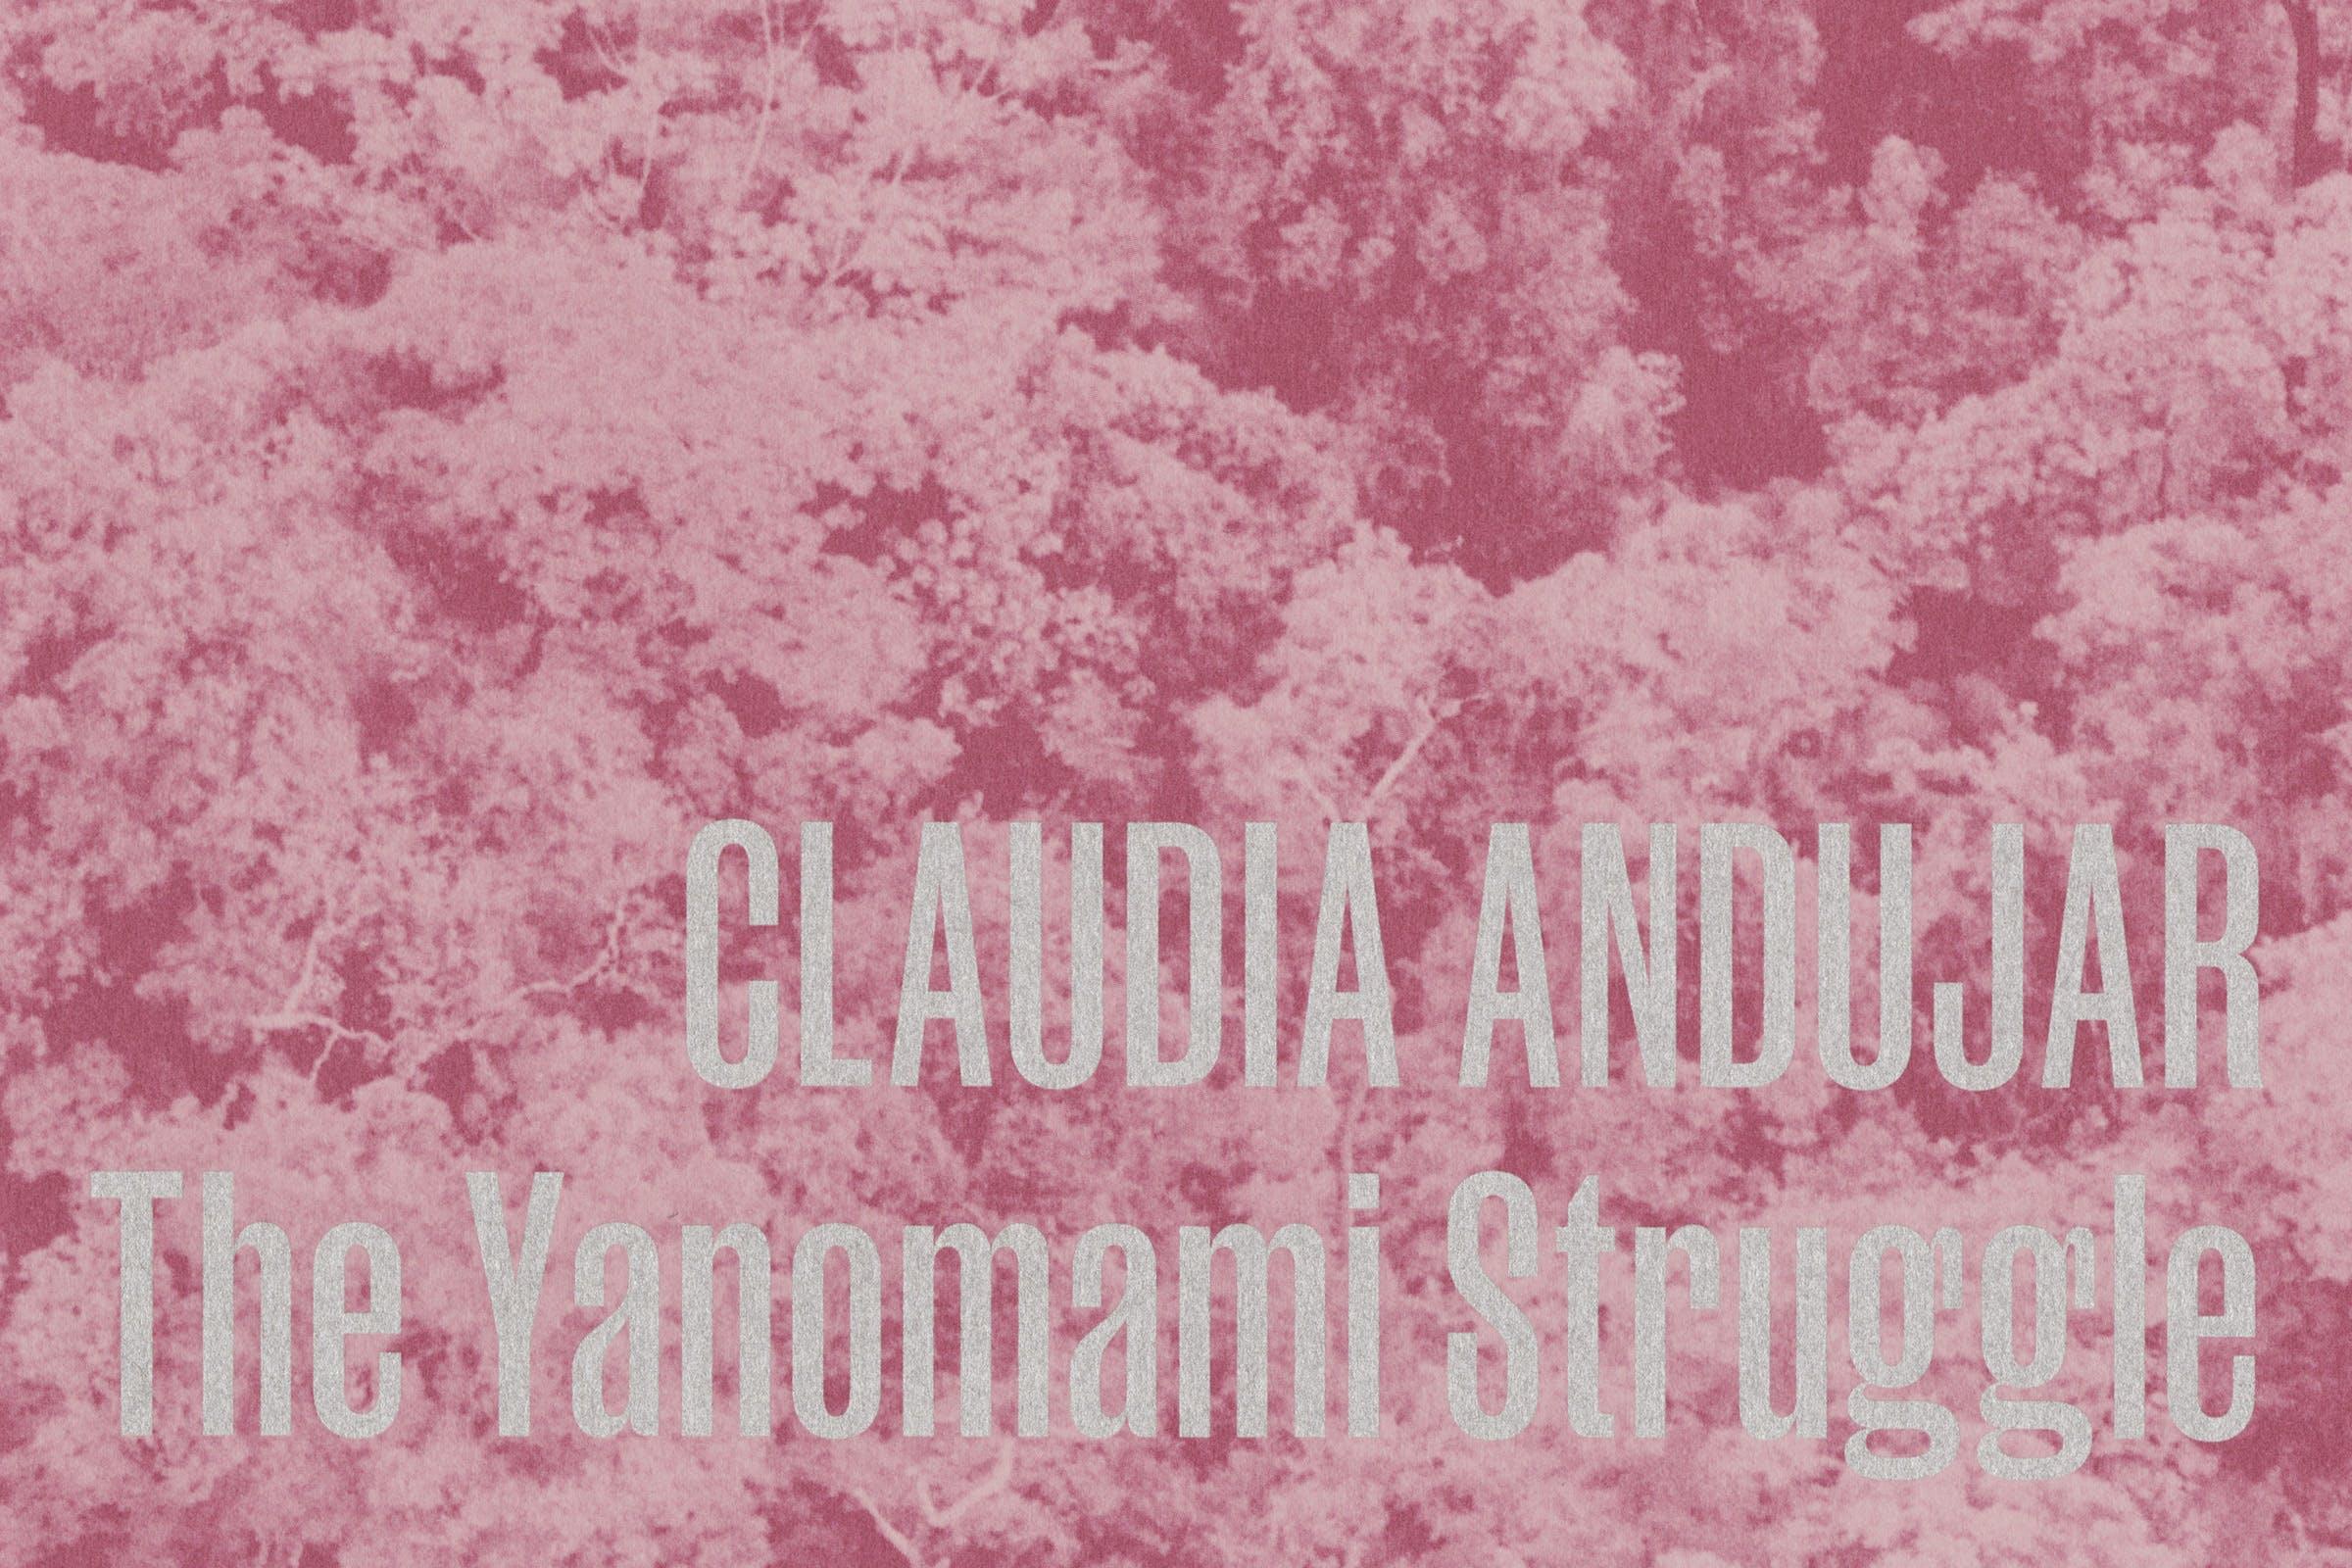 Barbican, Claudia Andujar, The Yanomami Struggle, Graphic Design by Wolfe Hall